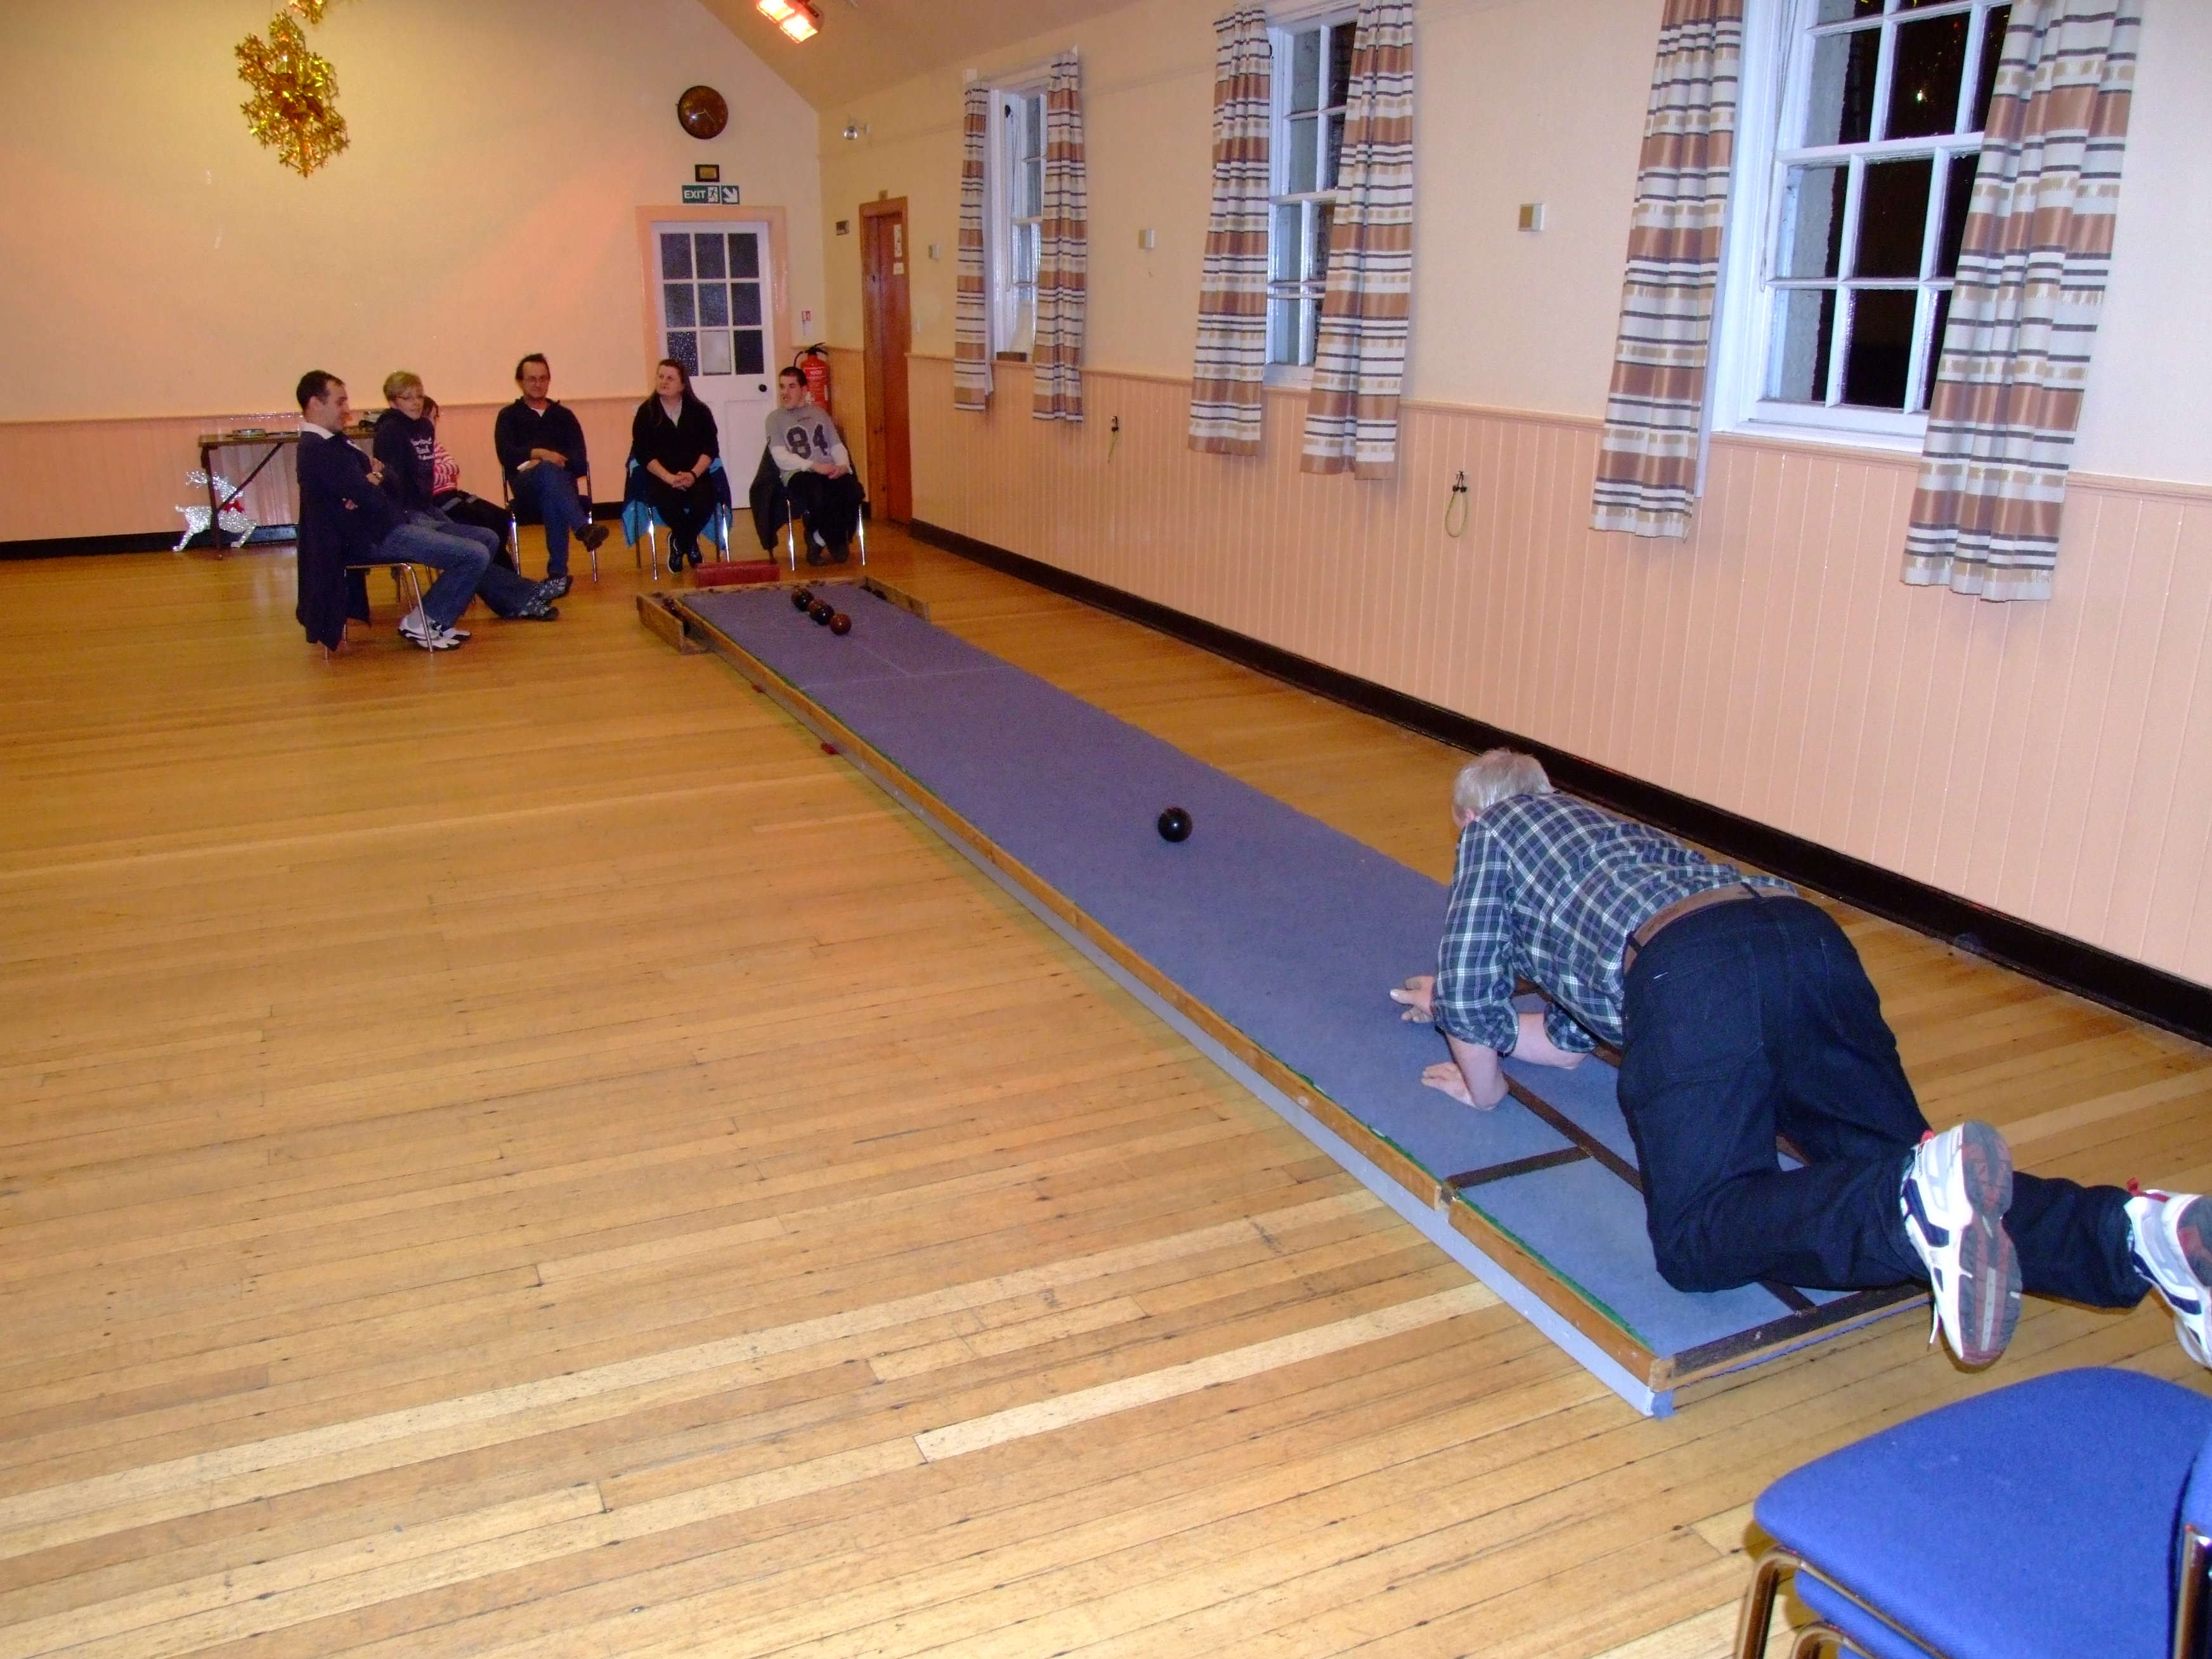 Canadian Carpet Flooring Windsor On Carpet Bowling Carpet